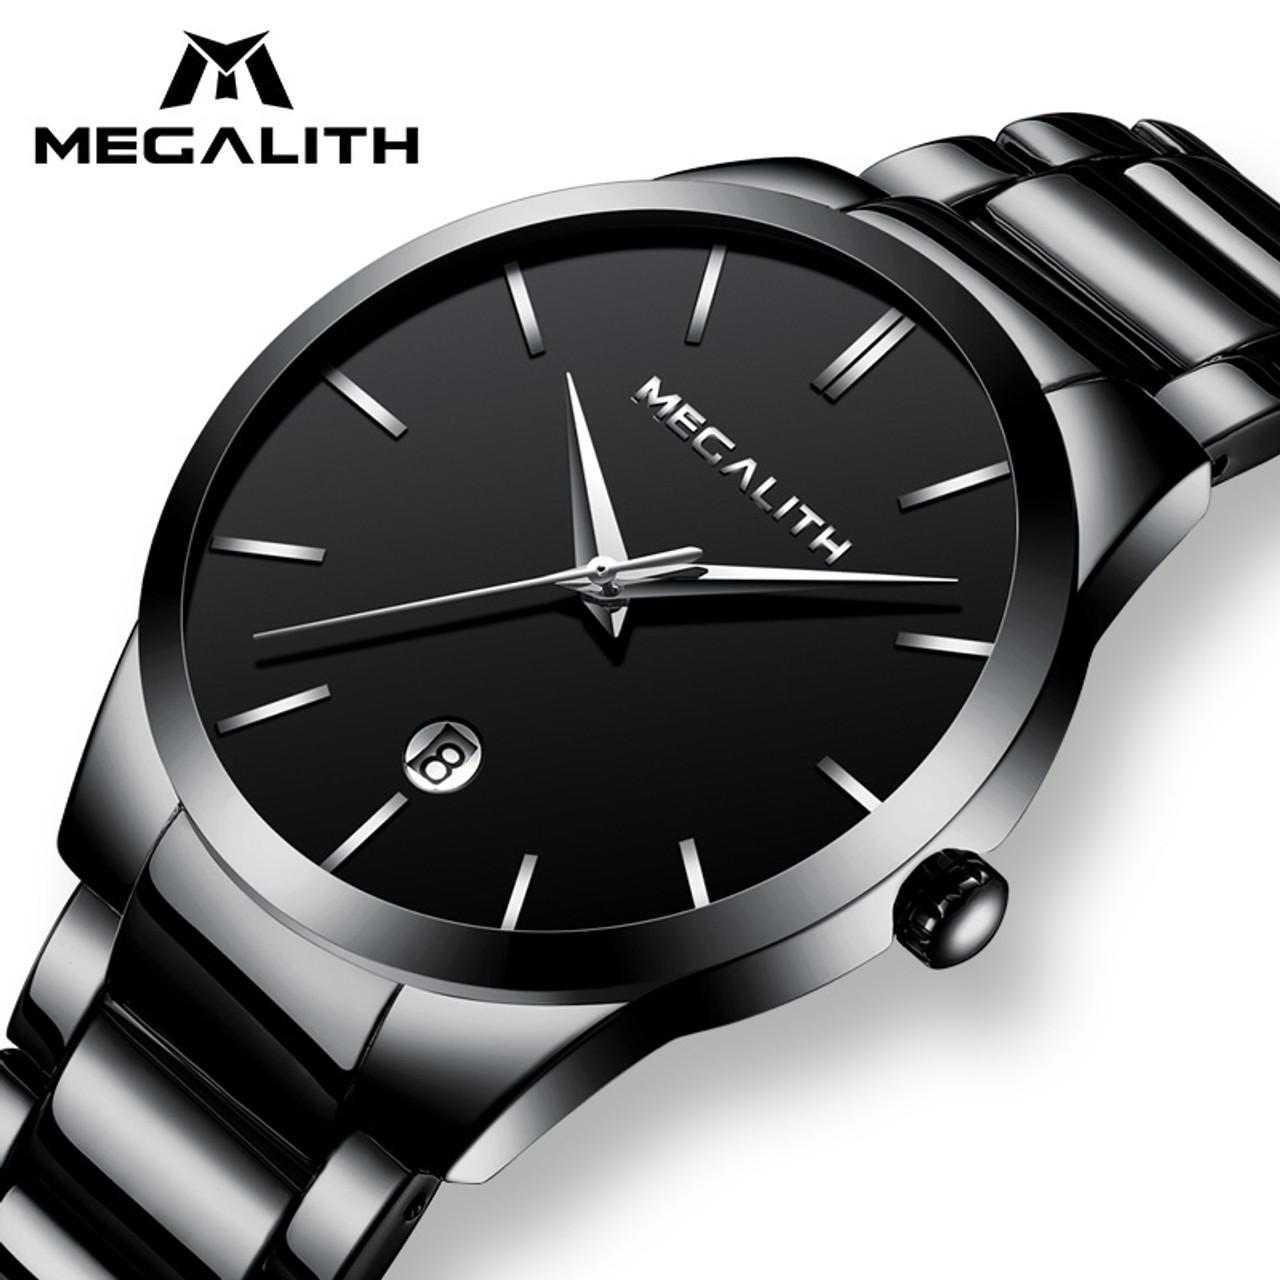 c3b2485966e4 MEGALITH Men Watch Waterproof Date Calendar Analogue Wristwatches Mens  Business Casual Quartz Watches For Man Clock ...